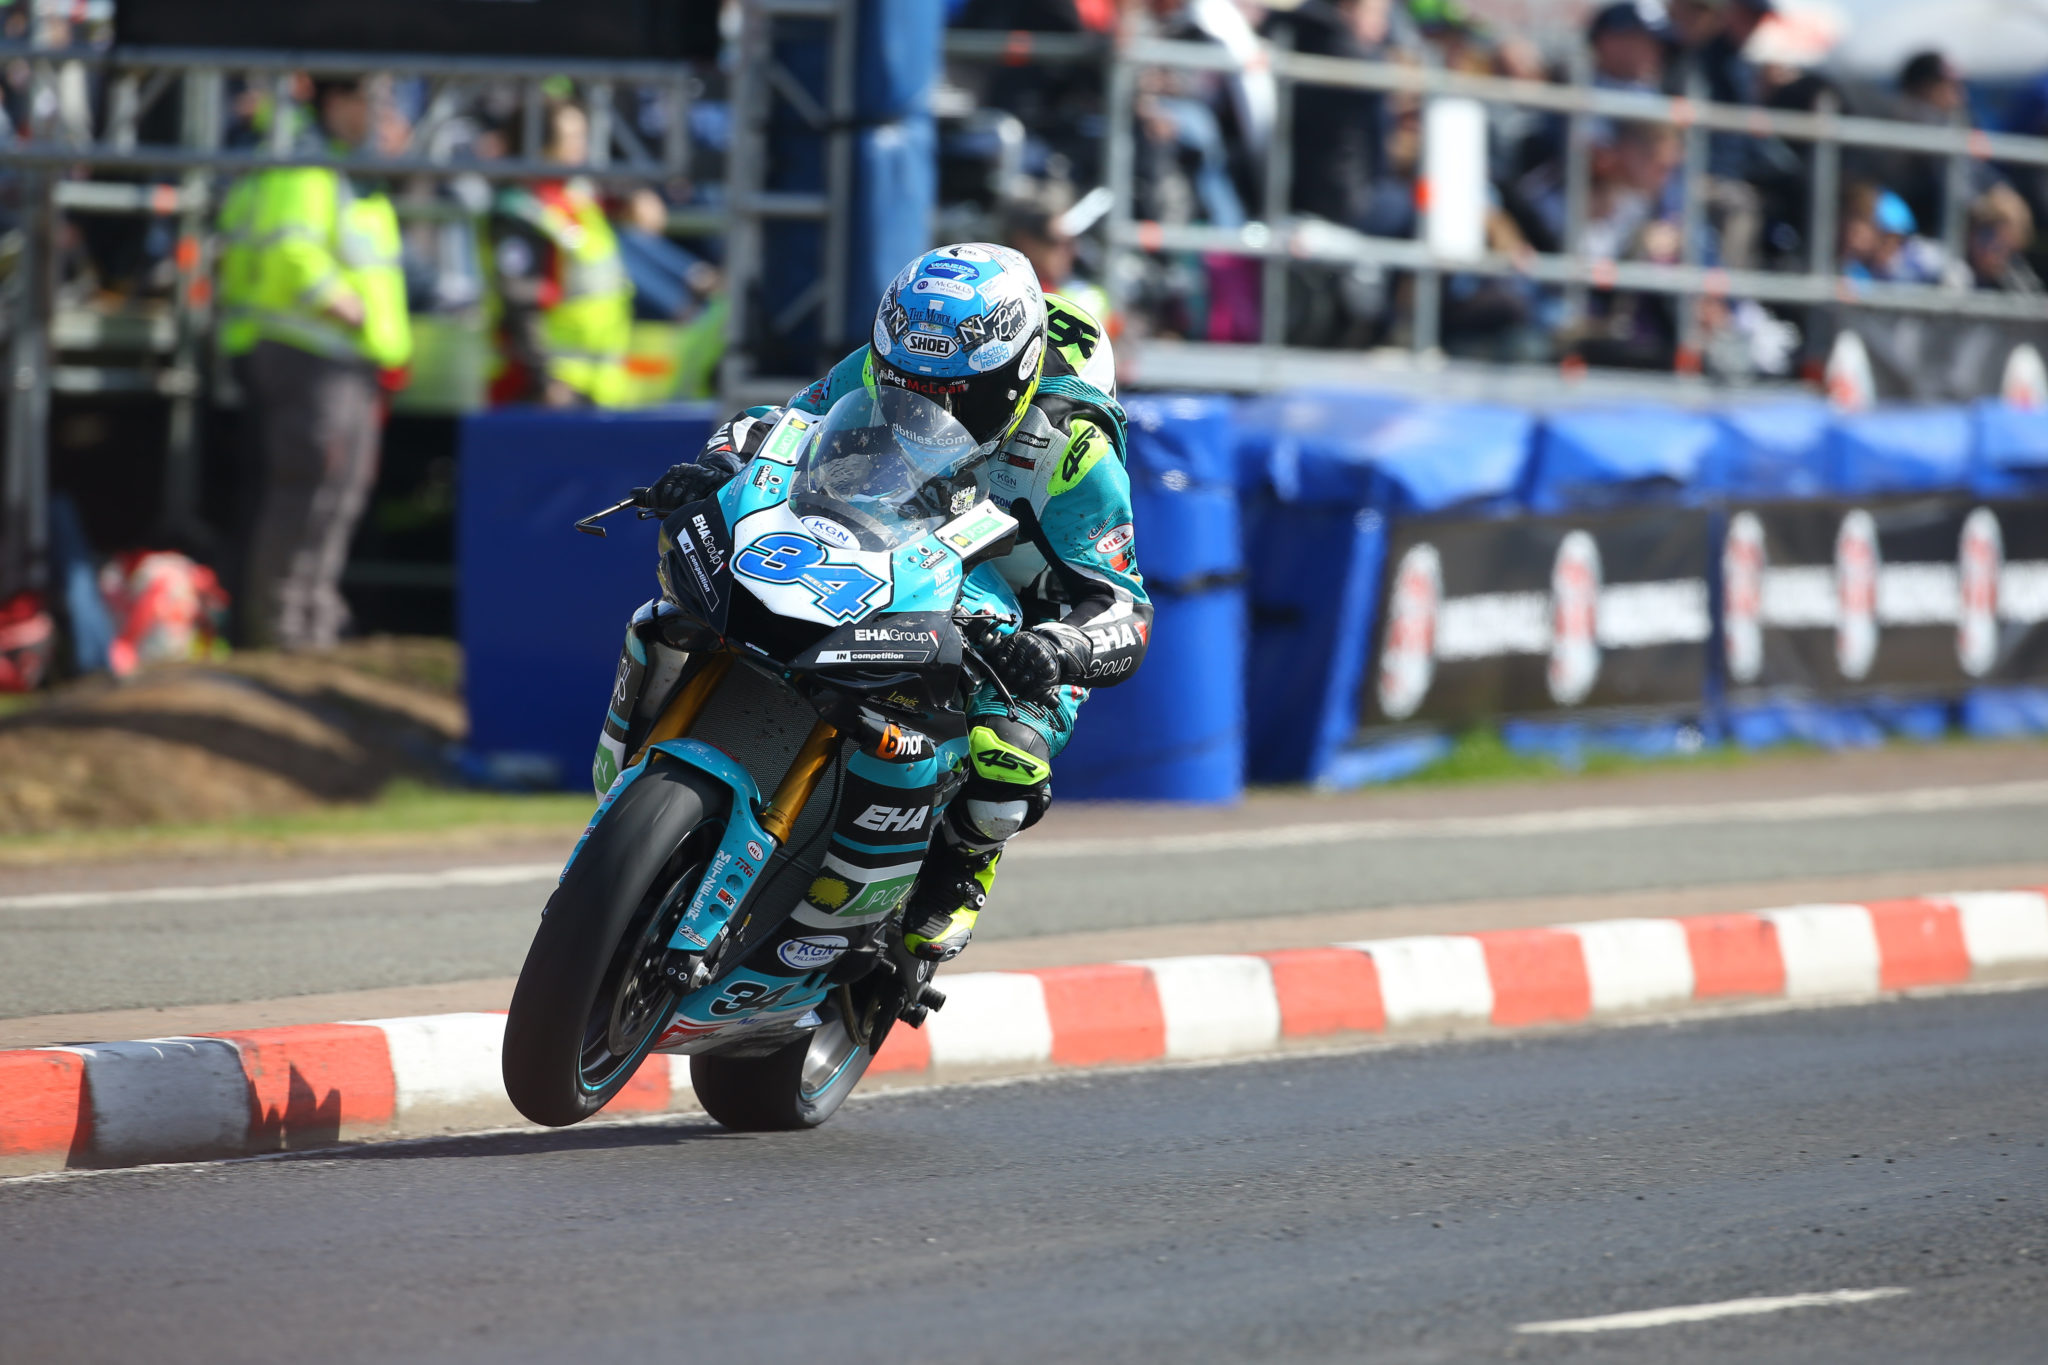 Seeley impressed at the weekend credit EHA Racing